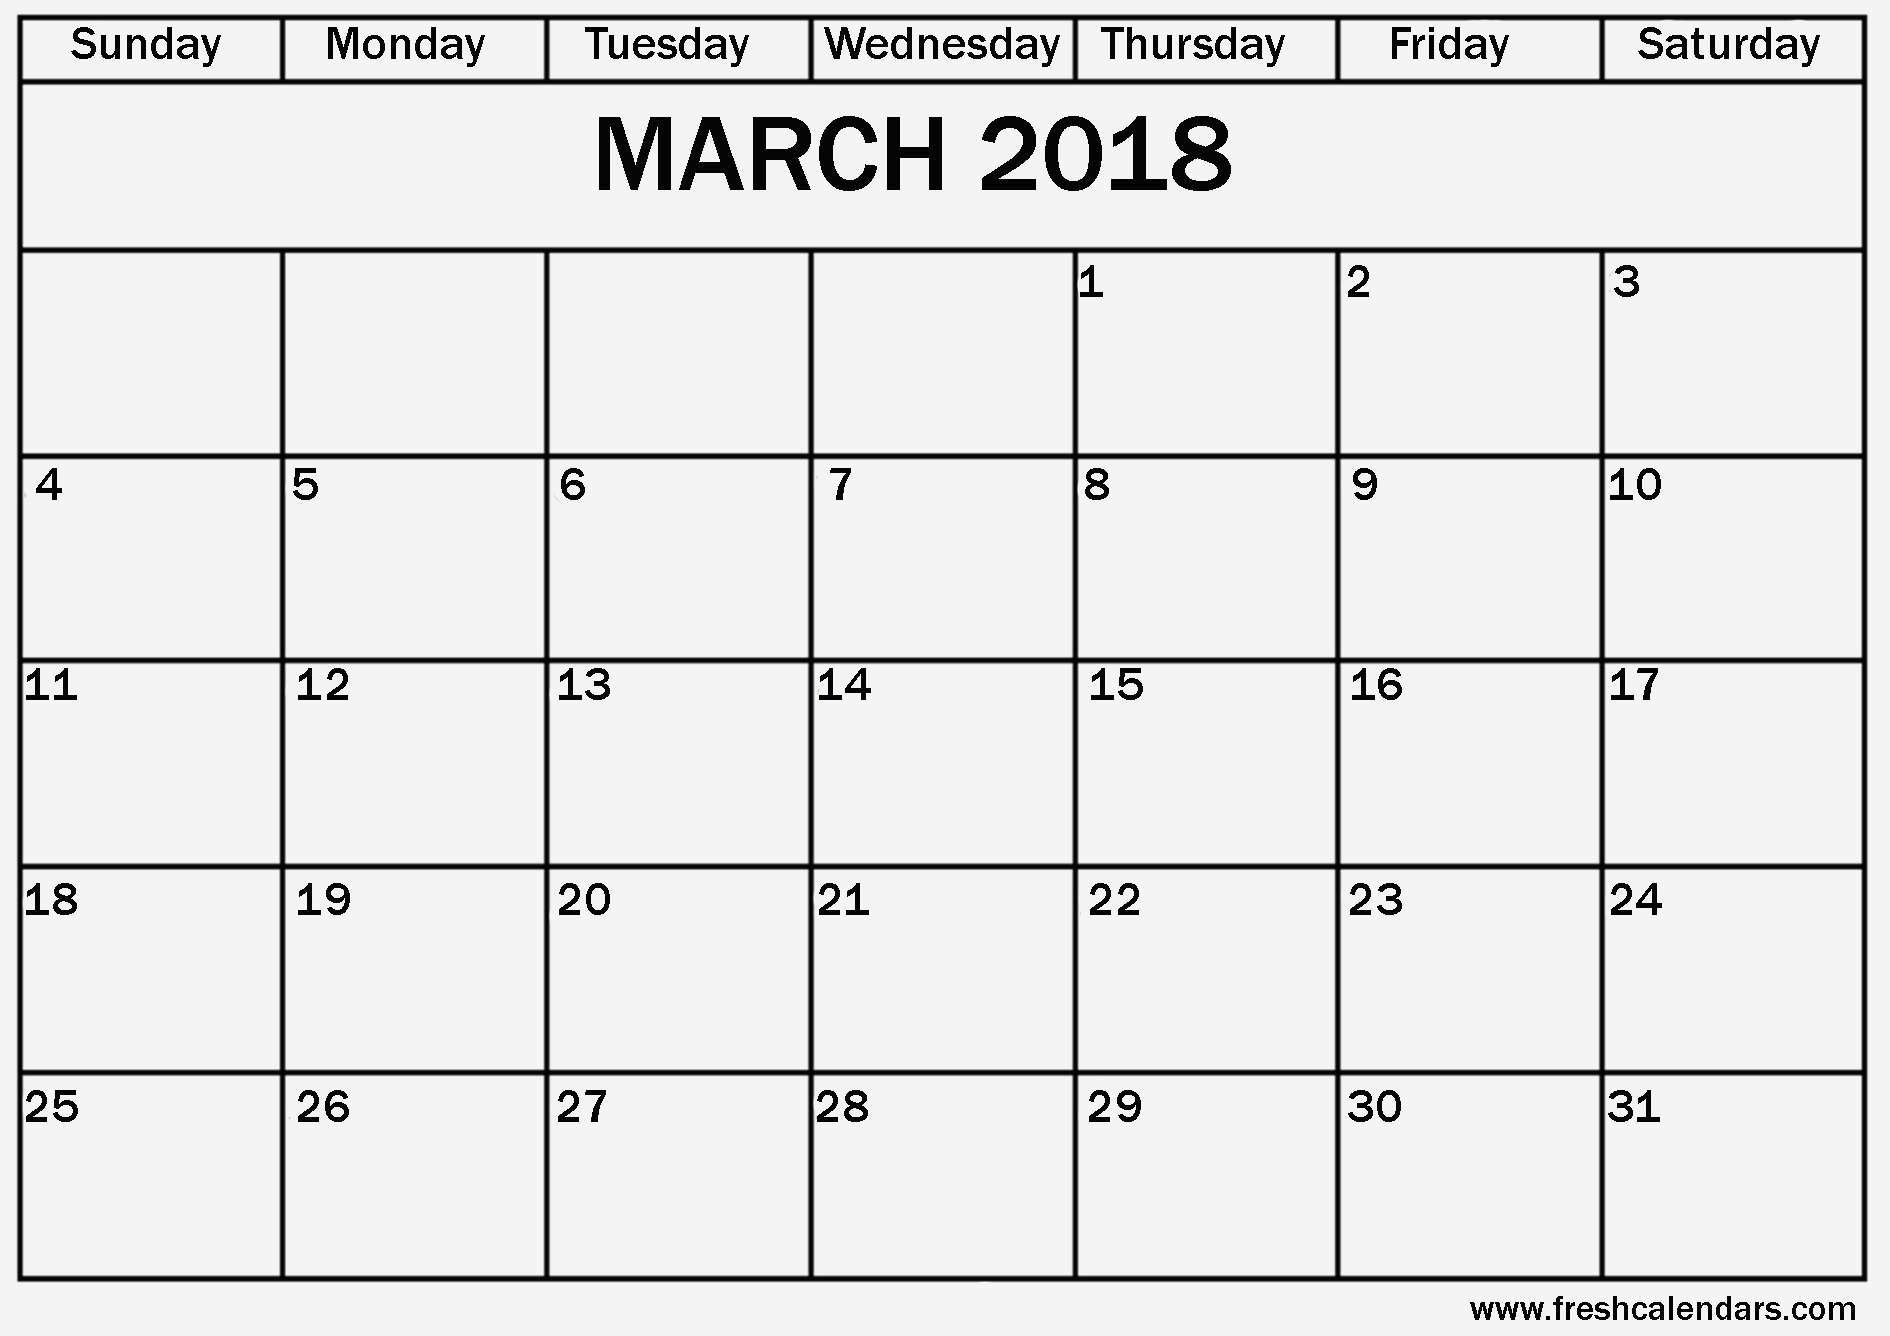 Medication Spreadsheet Organizer With Blank Calendar Chart New Bill Organizer Chart Bill Paying Organizer